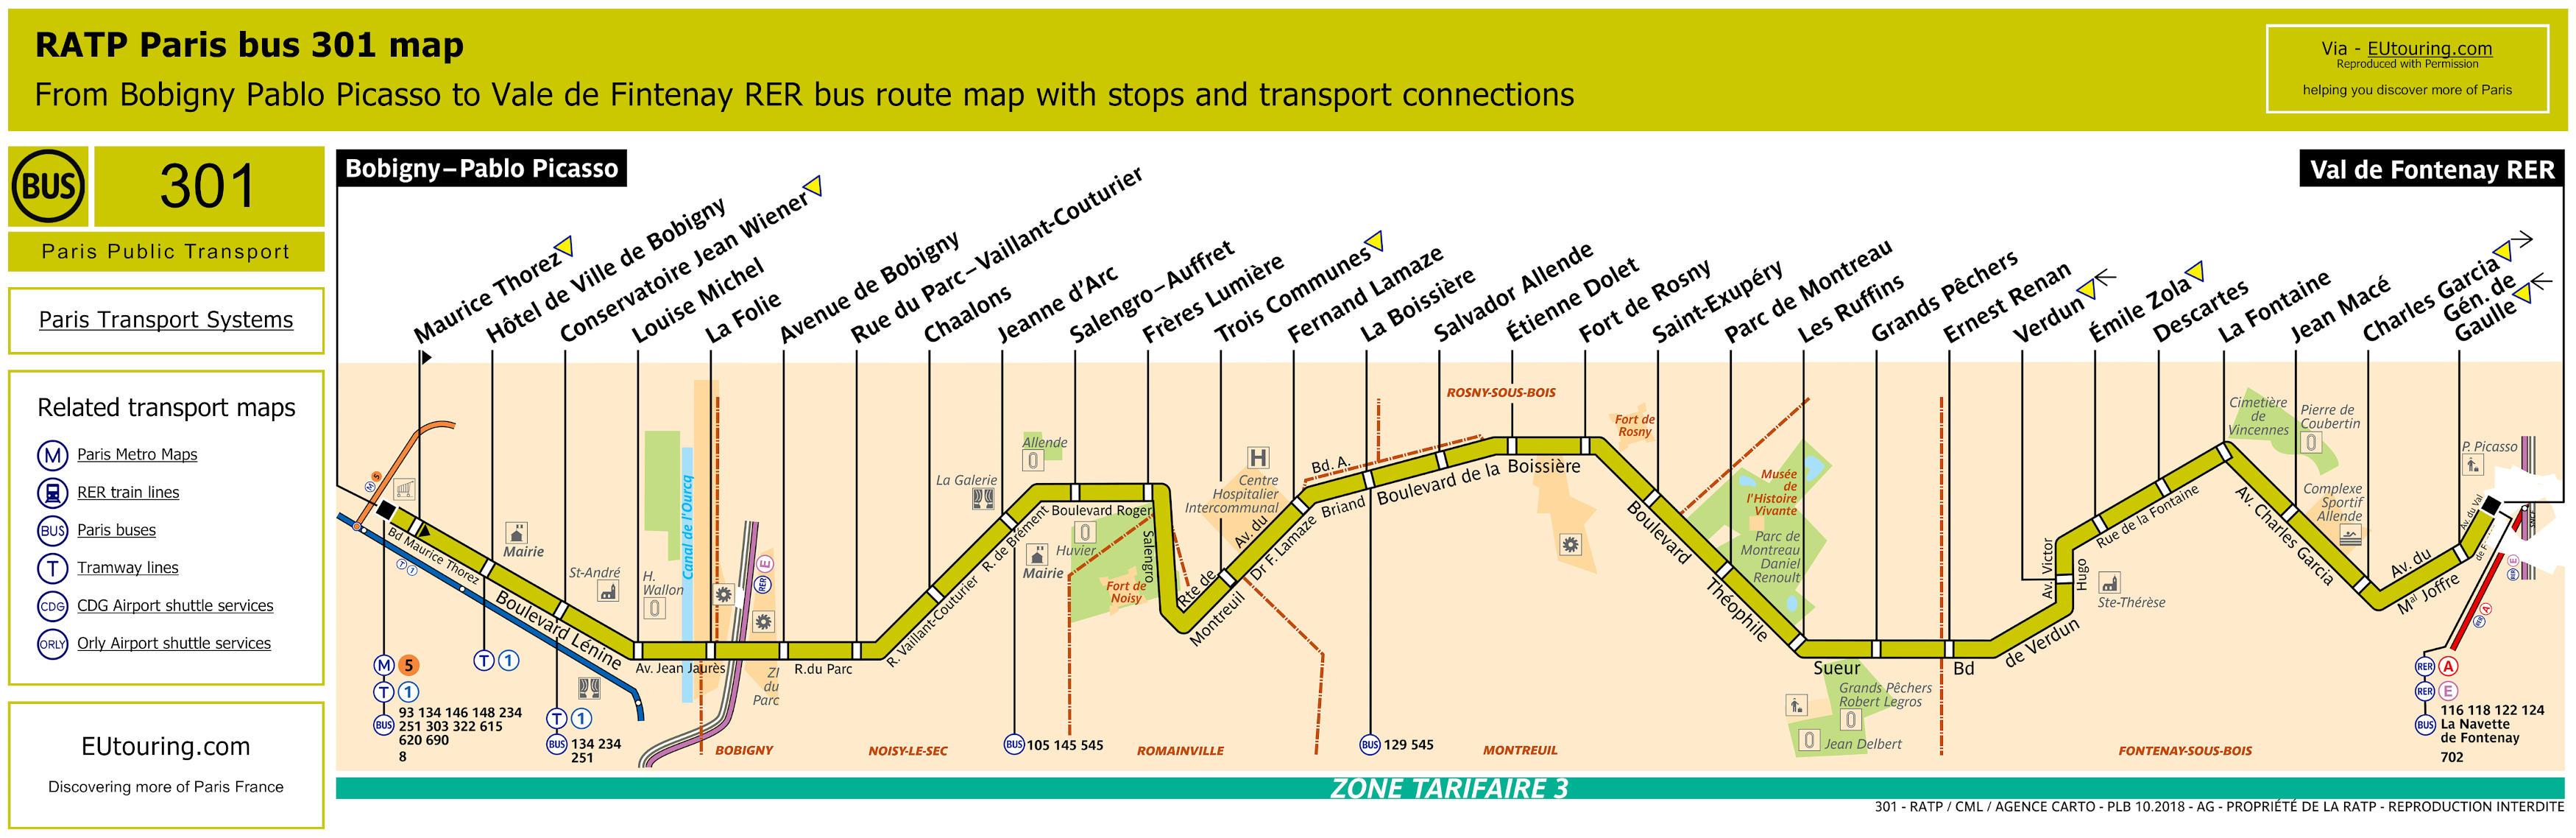 RATP Route Maps For Paris Bus Lines Through To - Us route 301 map